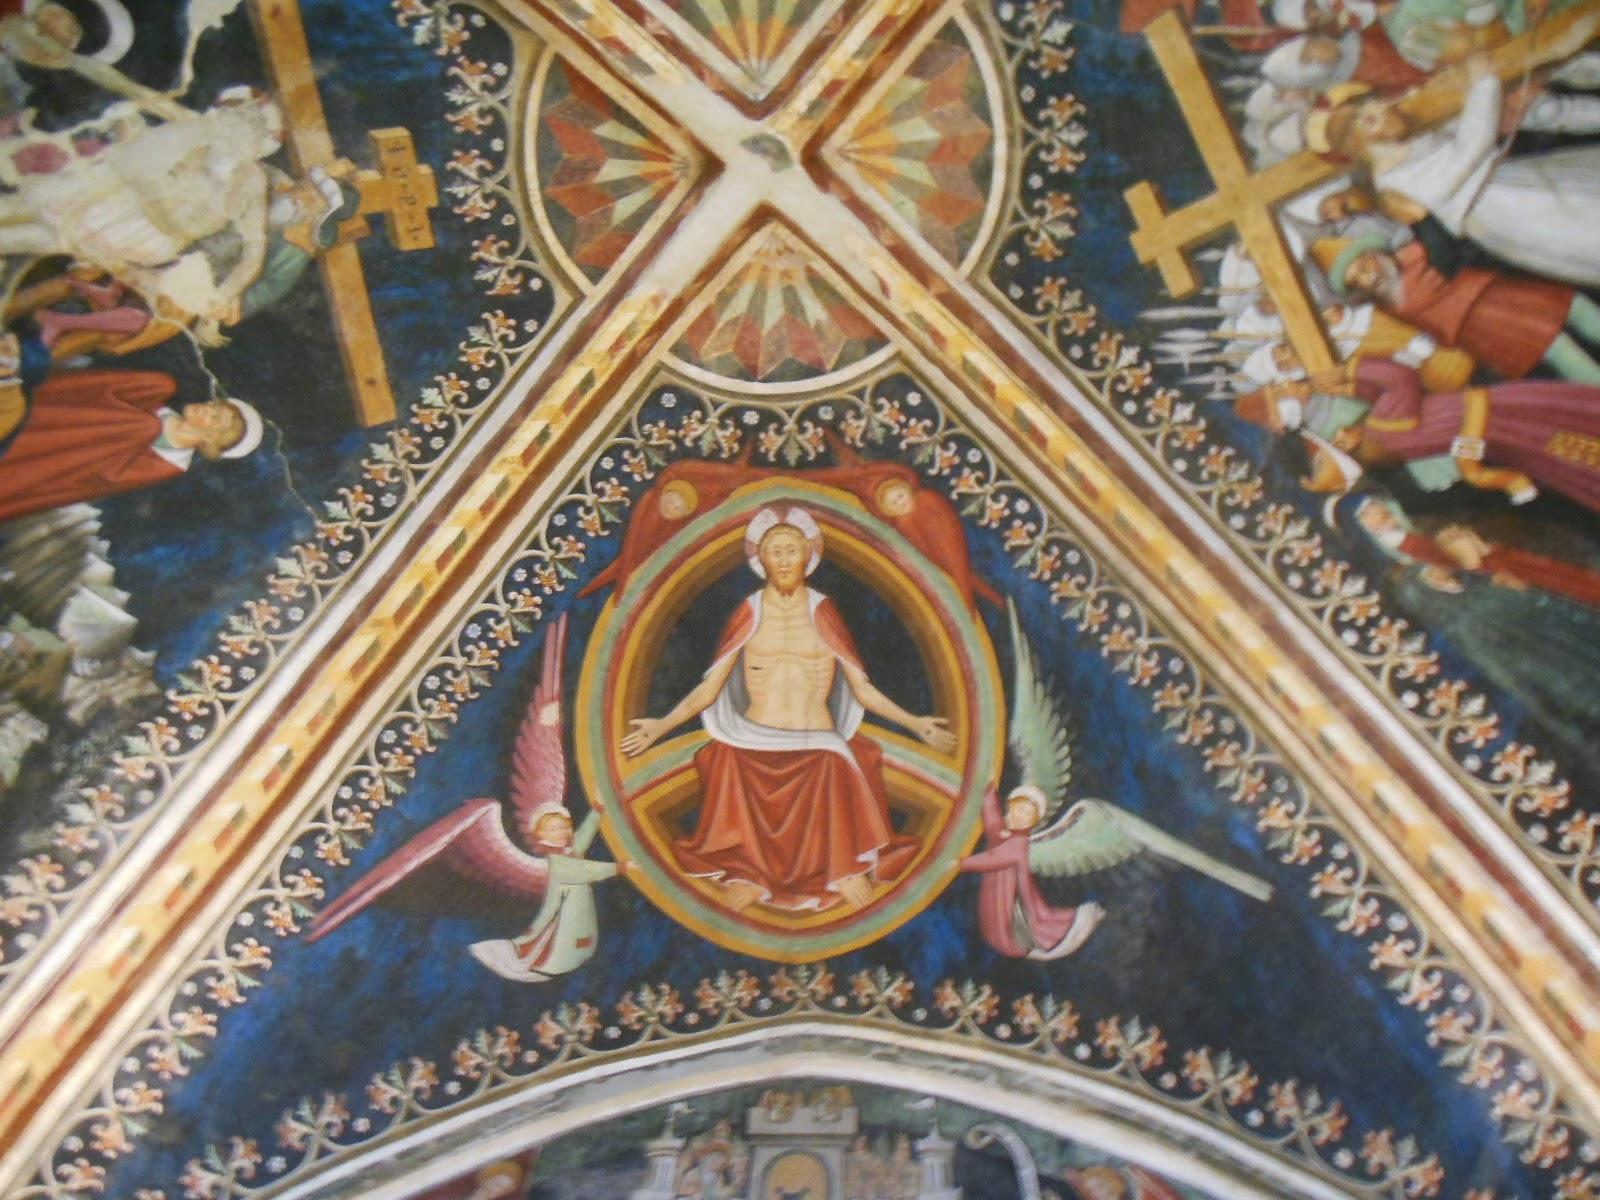 Nuestra Señora de Mondovi, la 'Regina Montis Regalis', Italia (30 oct)